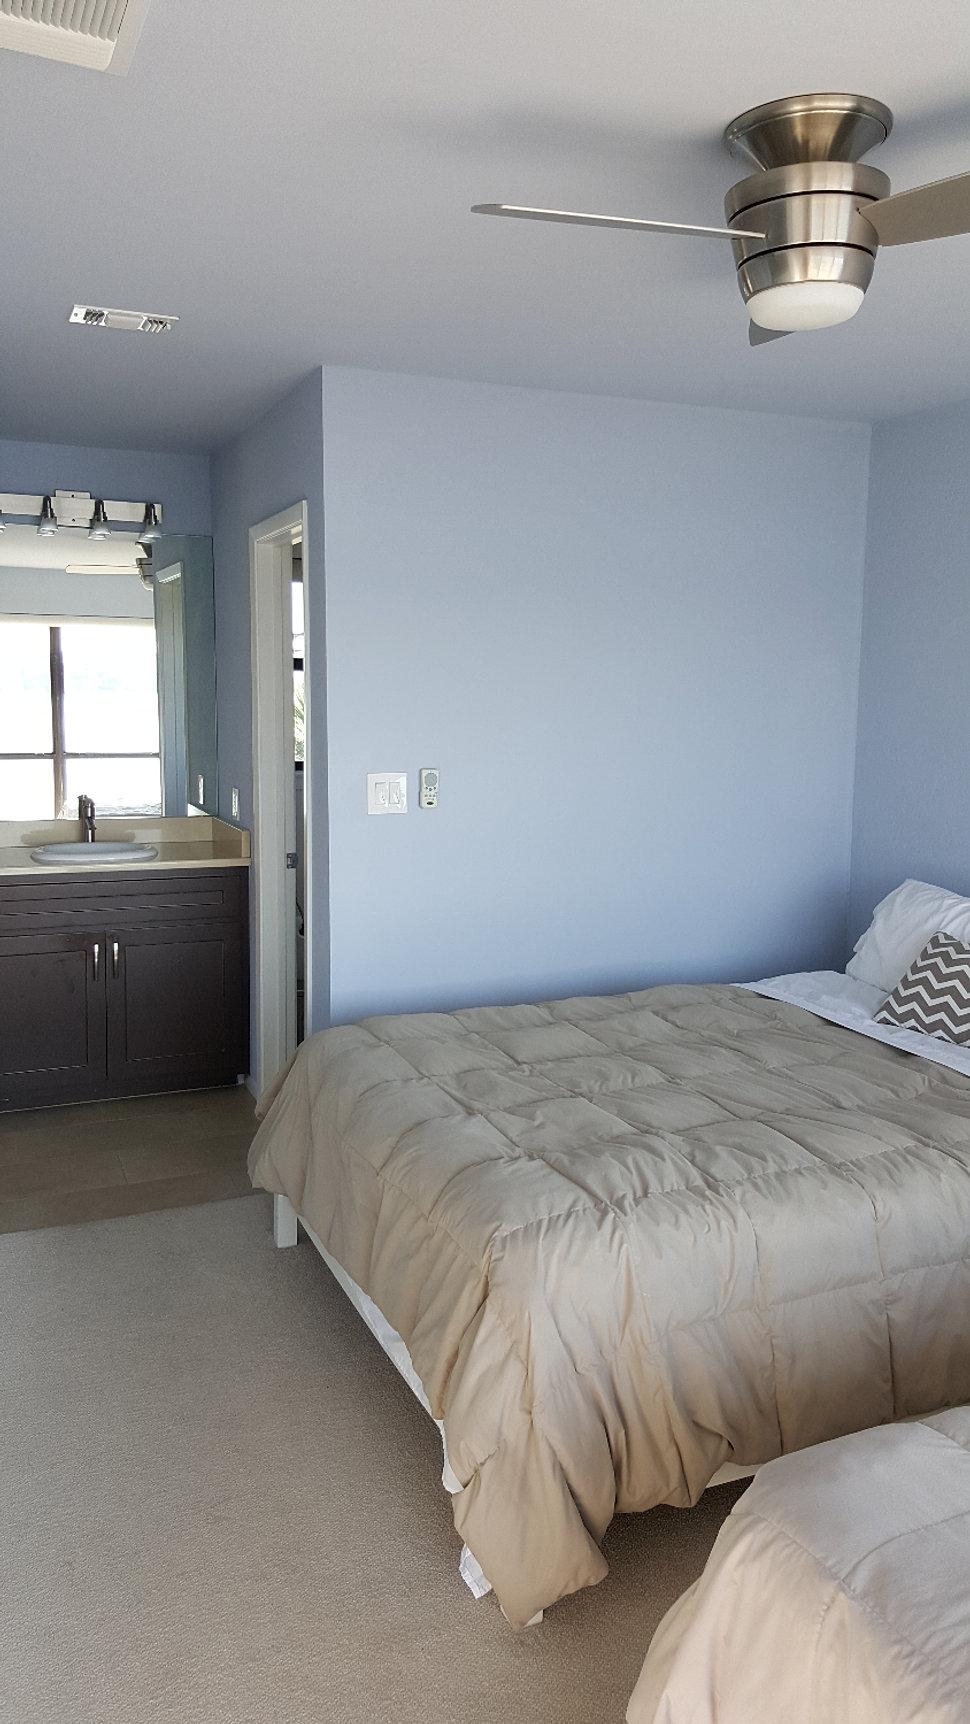 Lighthouse Bedroom Decor Horseshoe Bay Living